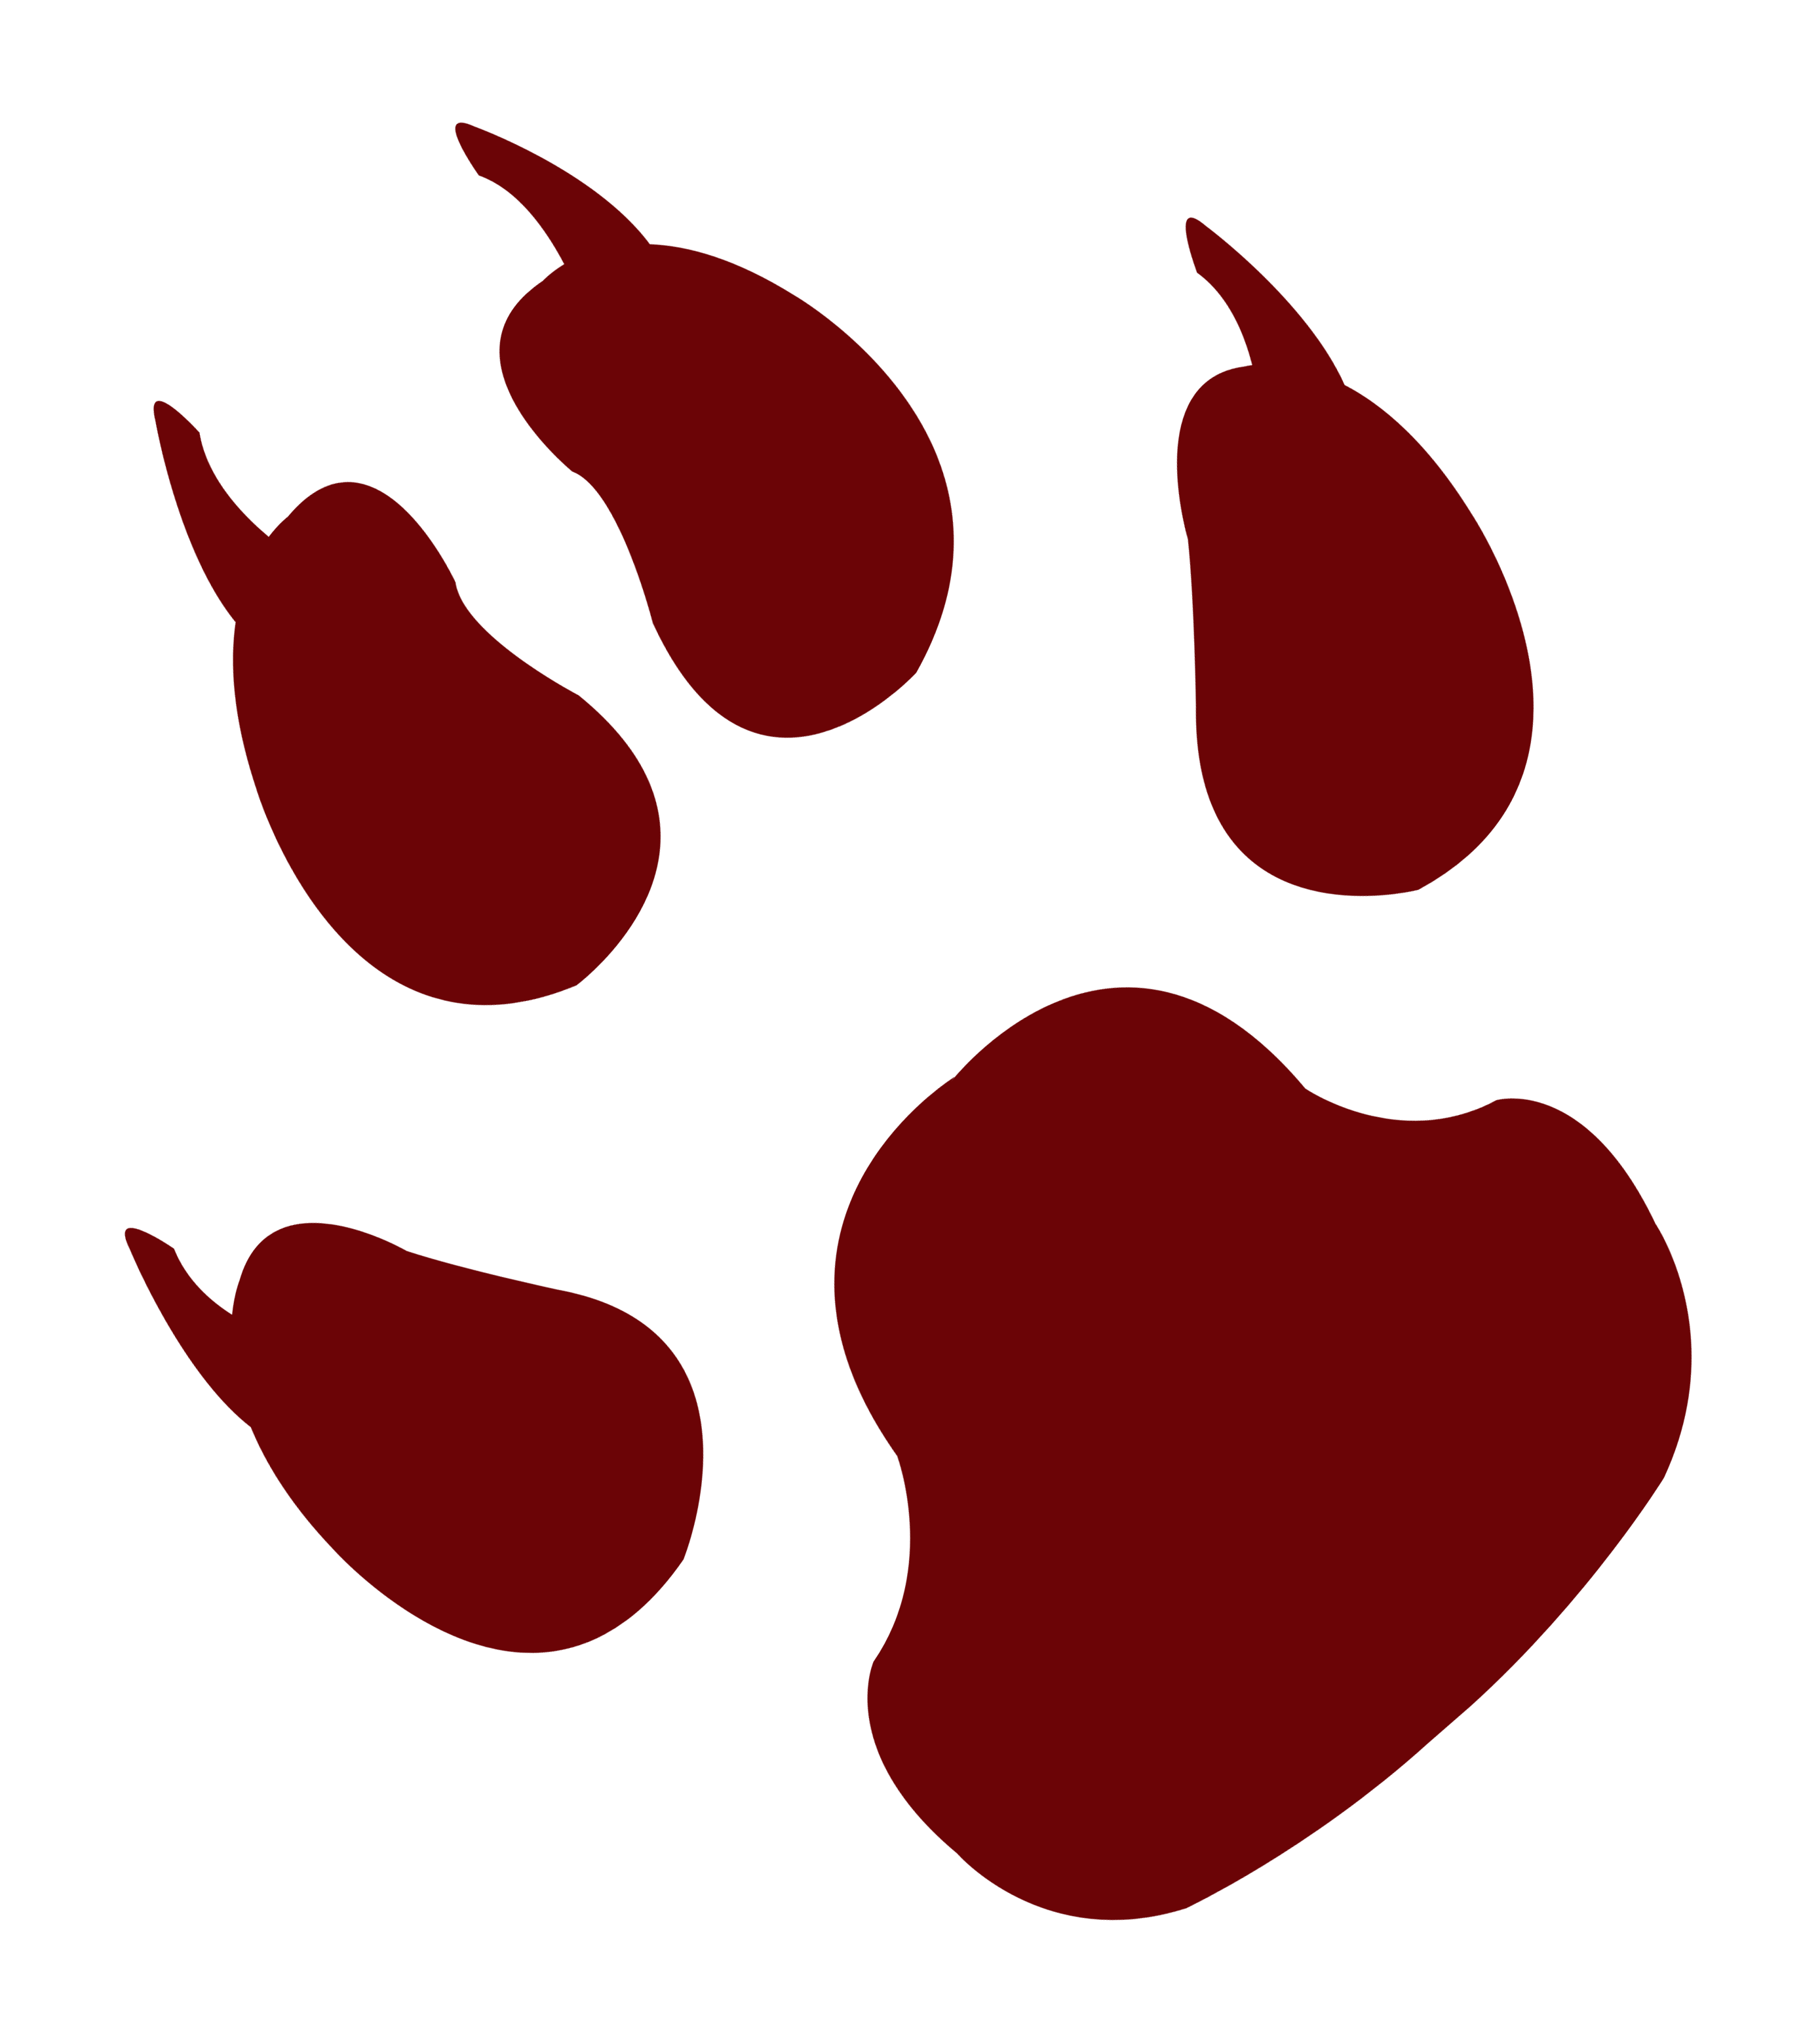 Animal footprint png image. Footprints clipart transparent background